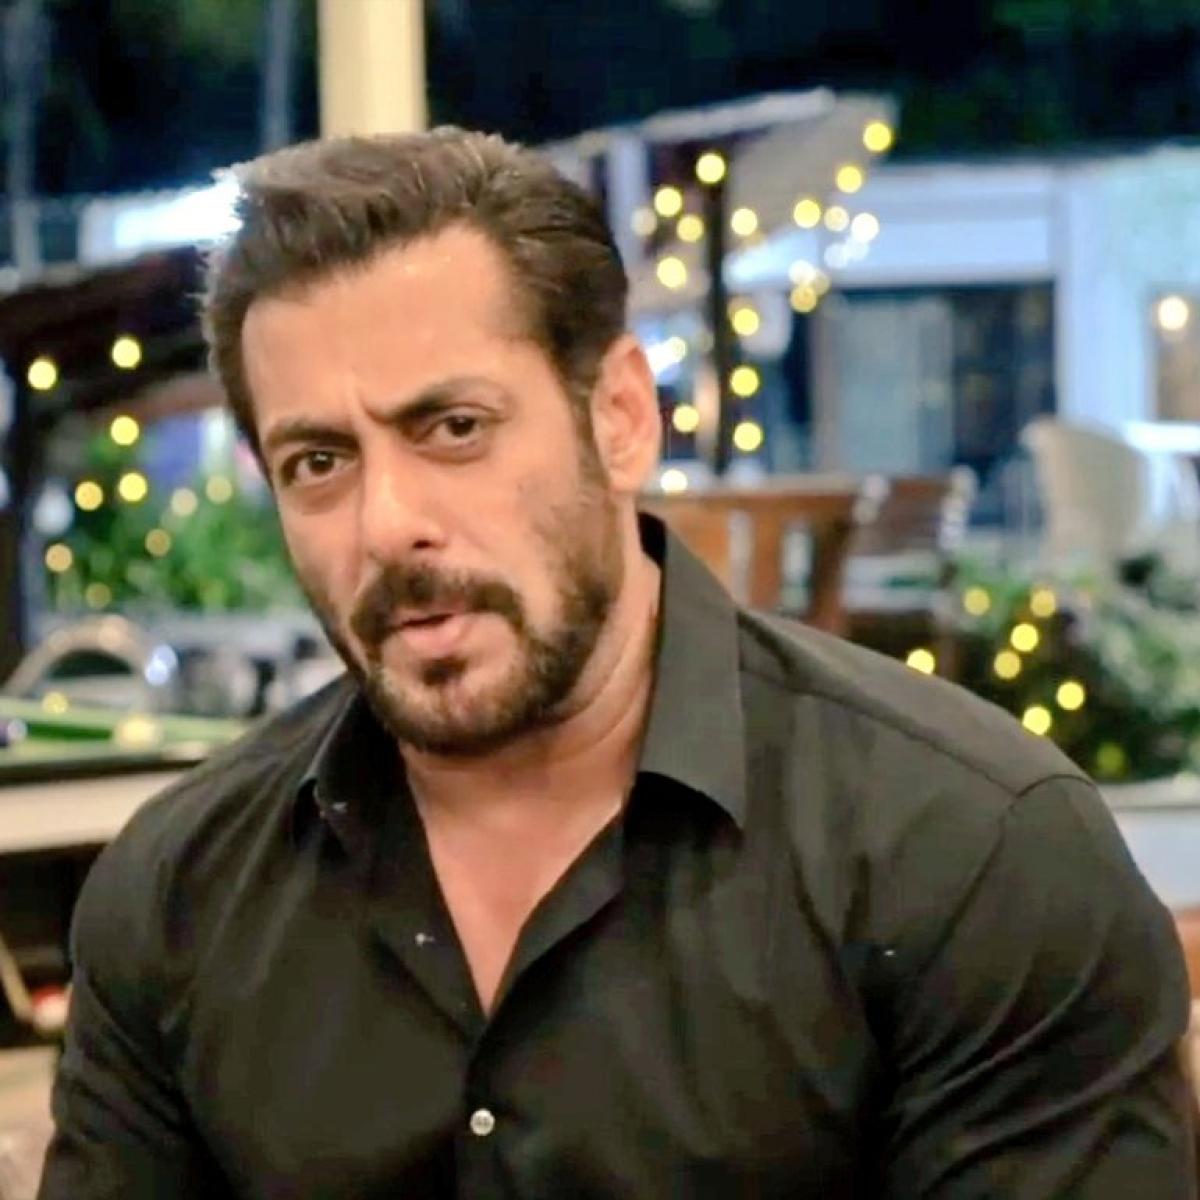 It's very essential to do sanitisation: Salman Khan